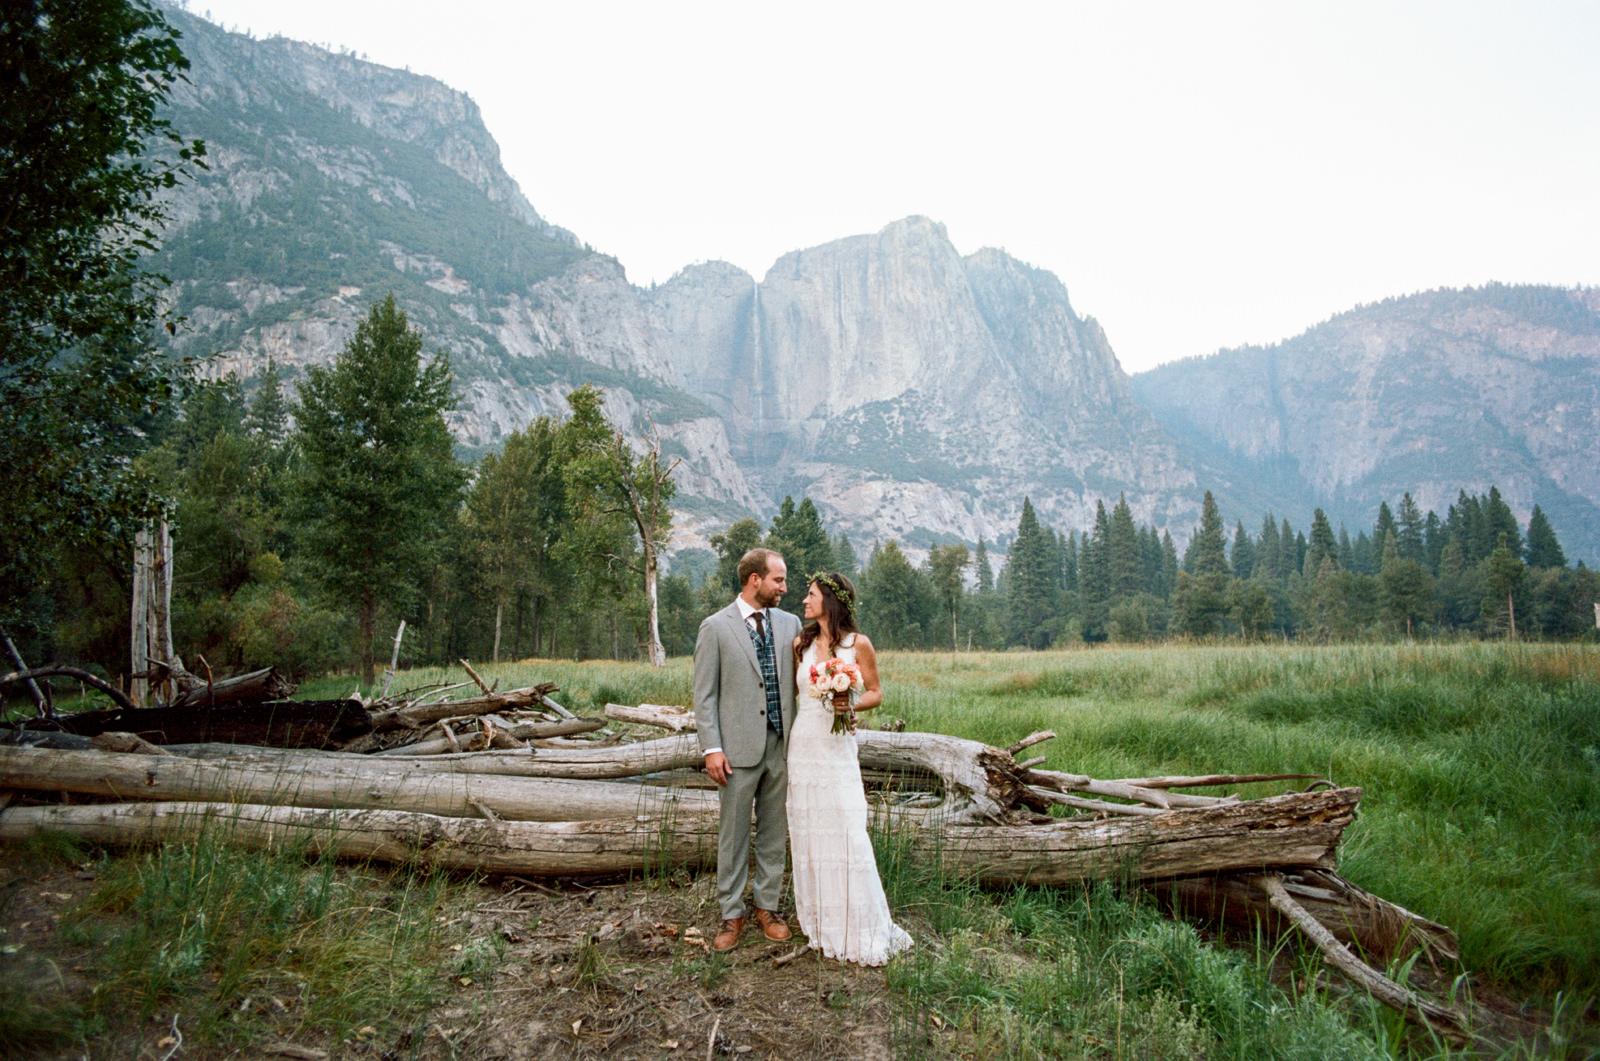 yosemite-intimate-wedding-079 YOSEMITE INTIMATE WEDDING